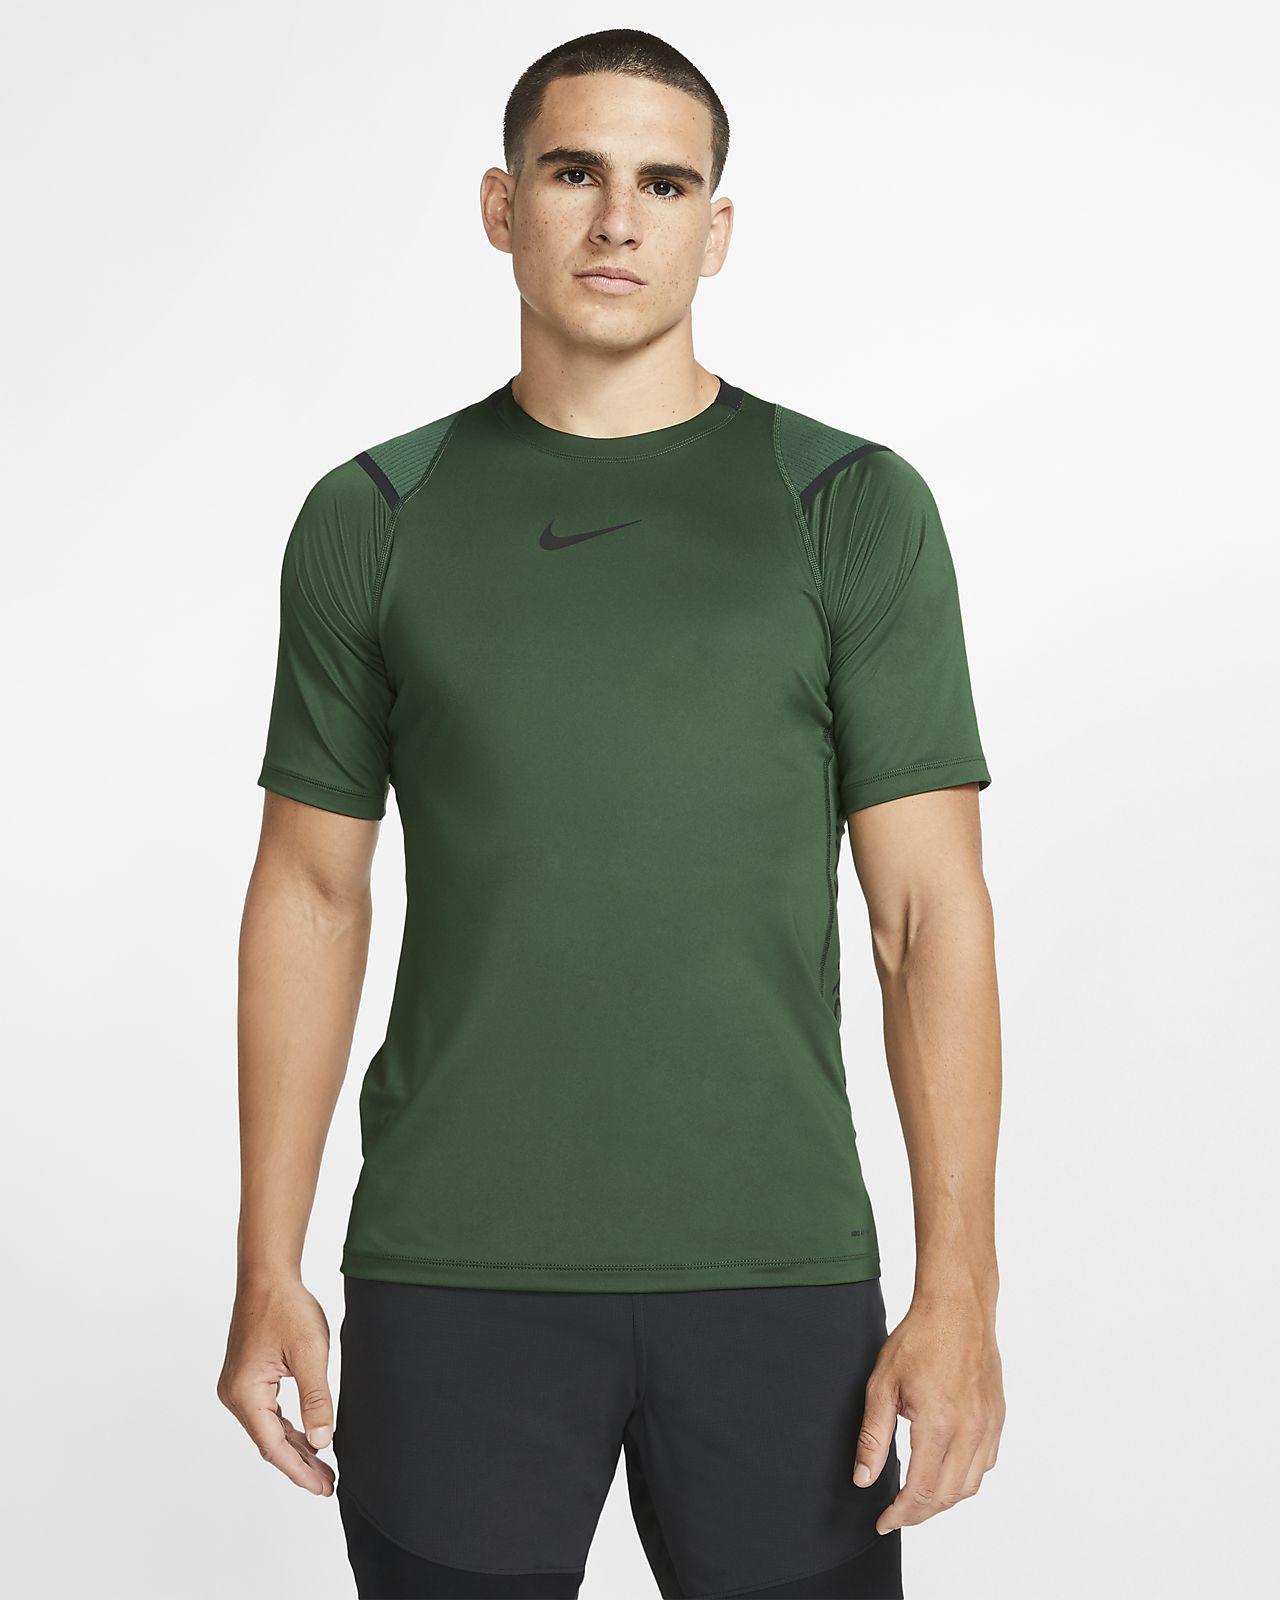 Nike Pro AeroAdapt Men's Short-Sleeve Top